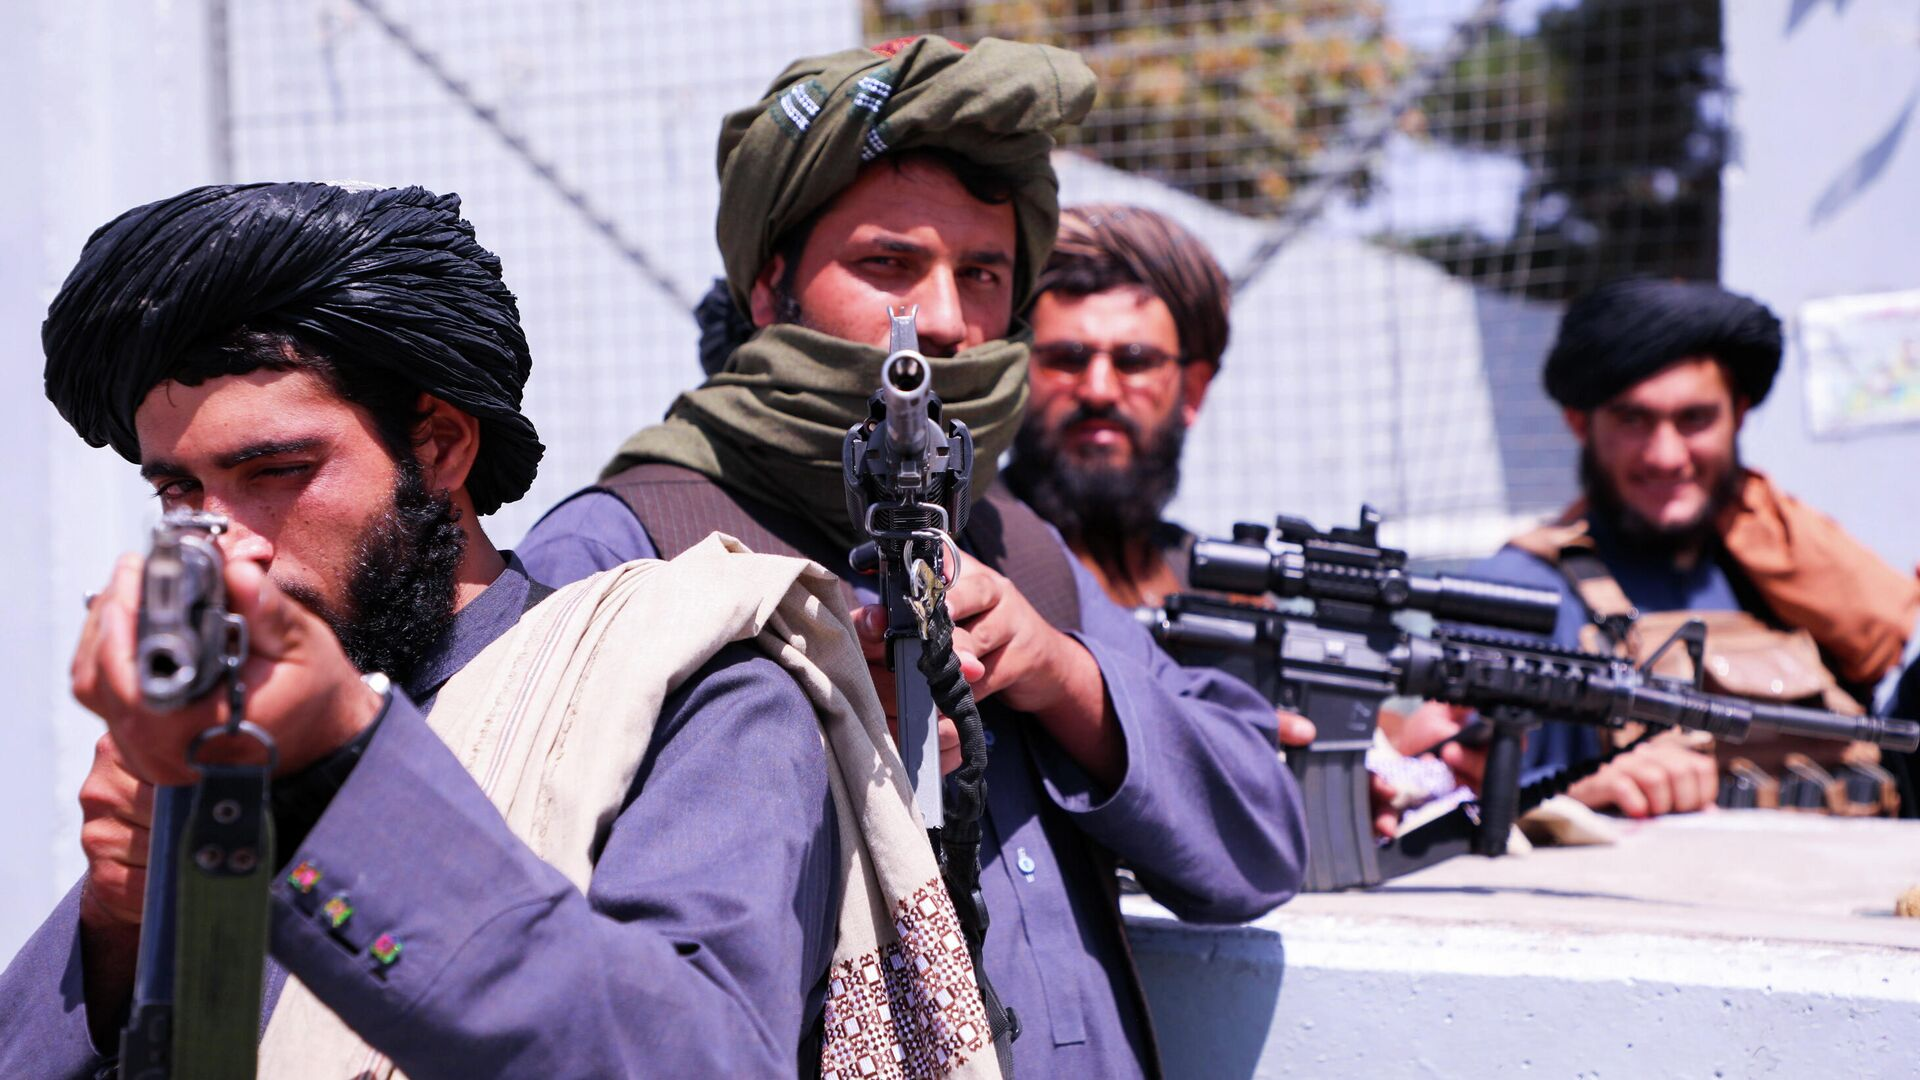 Боевики Талибана* возле аэропорта Кабула - РИА Новости, 1920, 15.09.2021